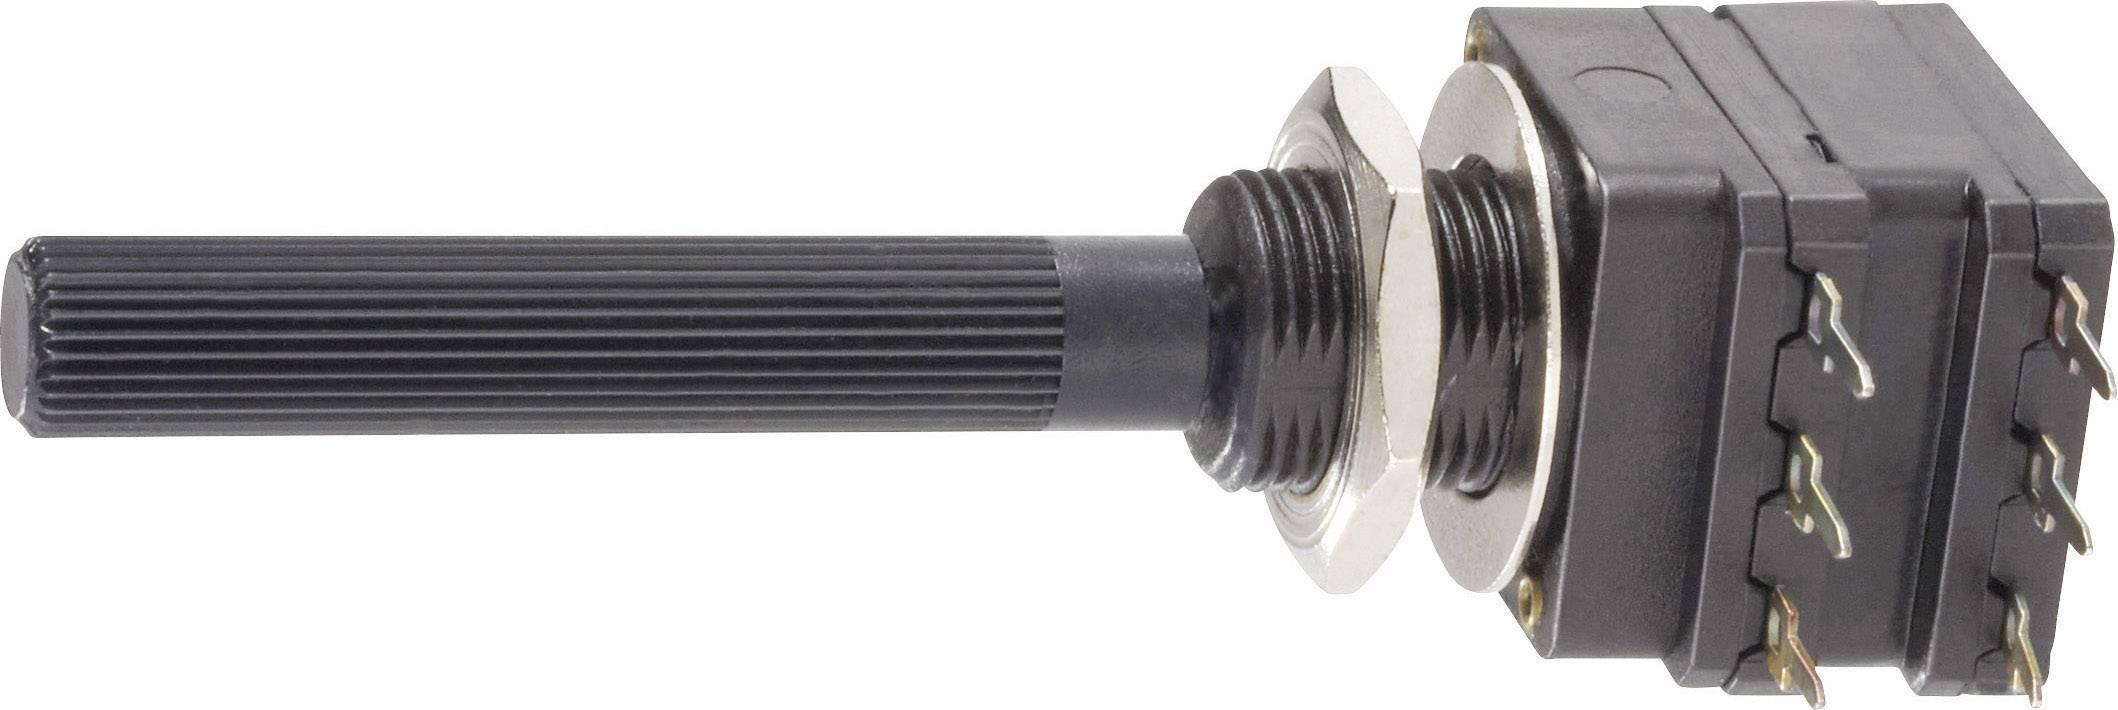 Otočný potenciometer stereo Piher PC16DH-10IP06474B2020MTA PC16DH-10IP06474B2020MTA, 0.1 W, 470 kOhm, 1 ks